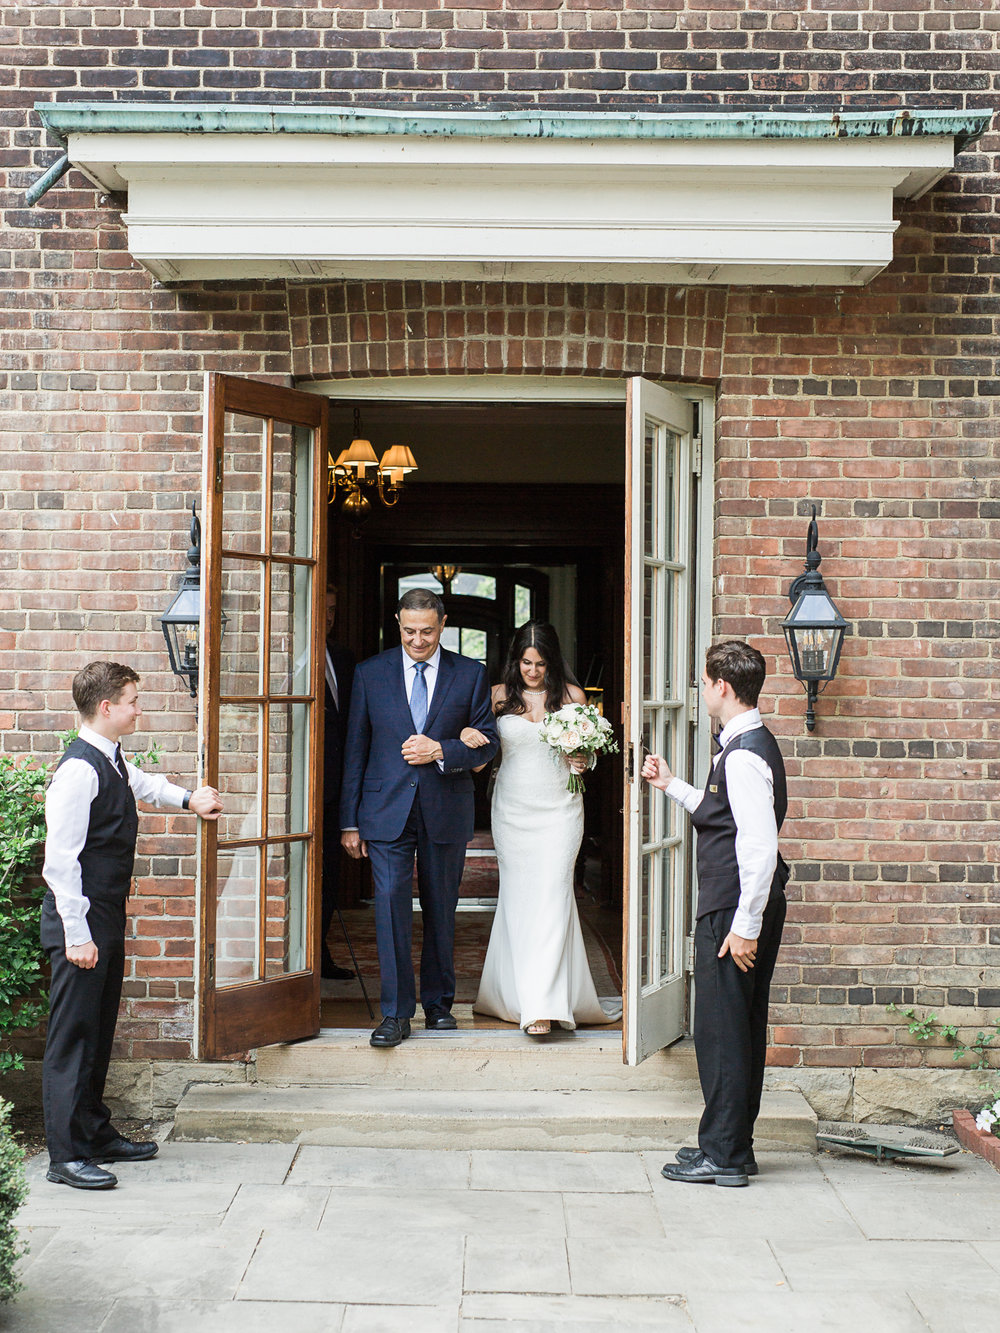 0474-Nadia-Chris-Married-When He Founf Her-Toronto Golf Club.jpg